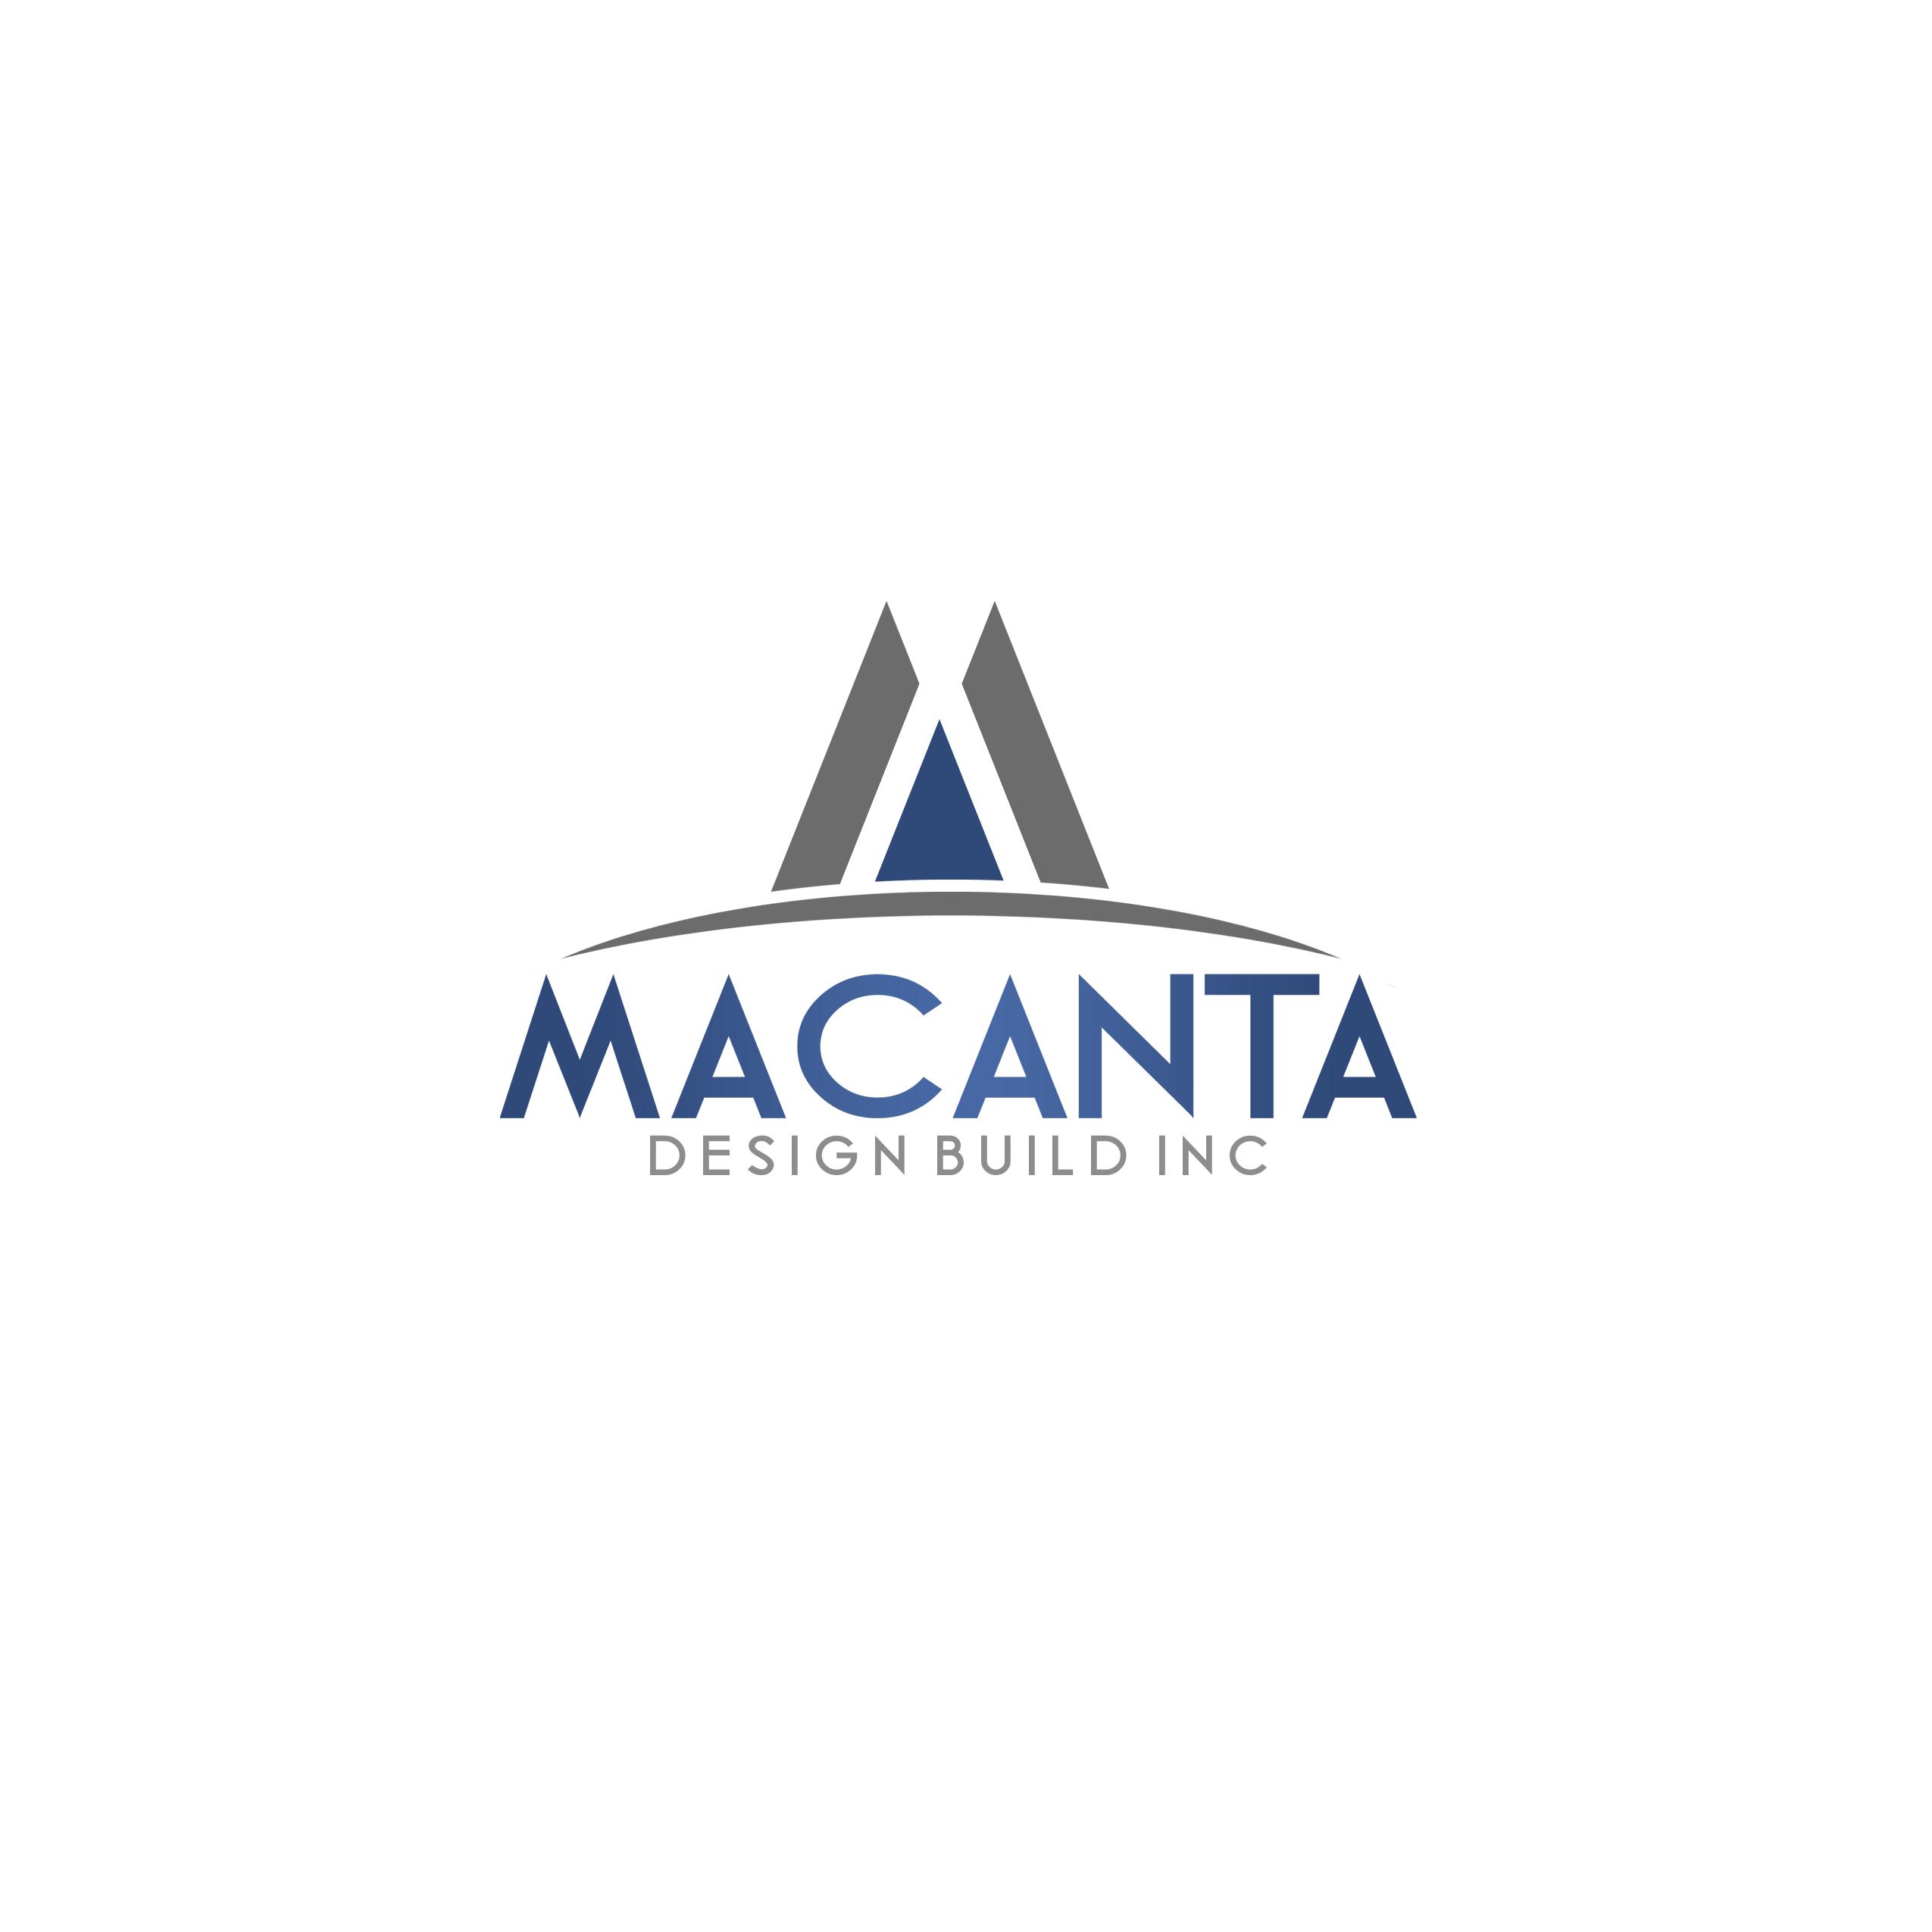 Logo Design by Allan Esclamado - Entry No. 72 in the Logo Design Contest Captivating Logo Design for Macanta Design Build Inc.